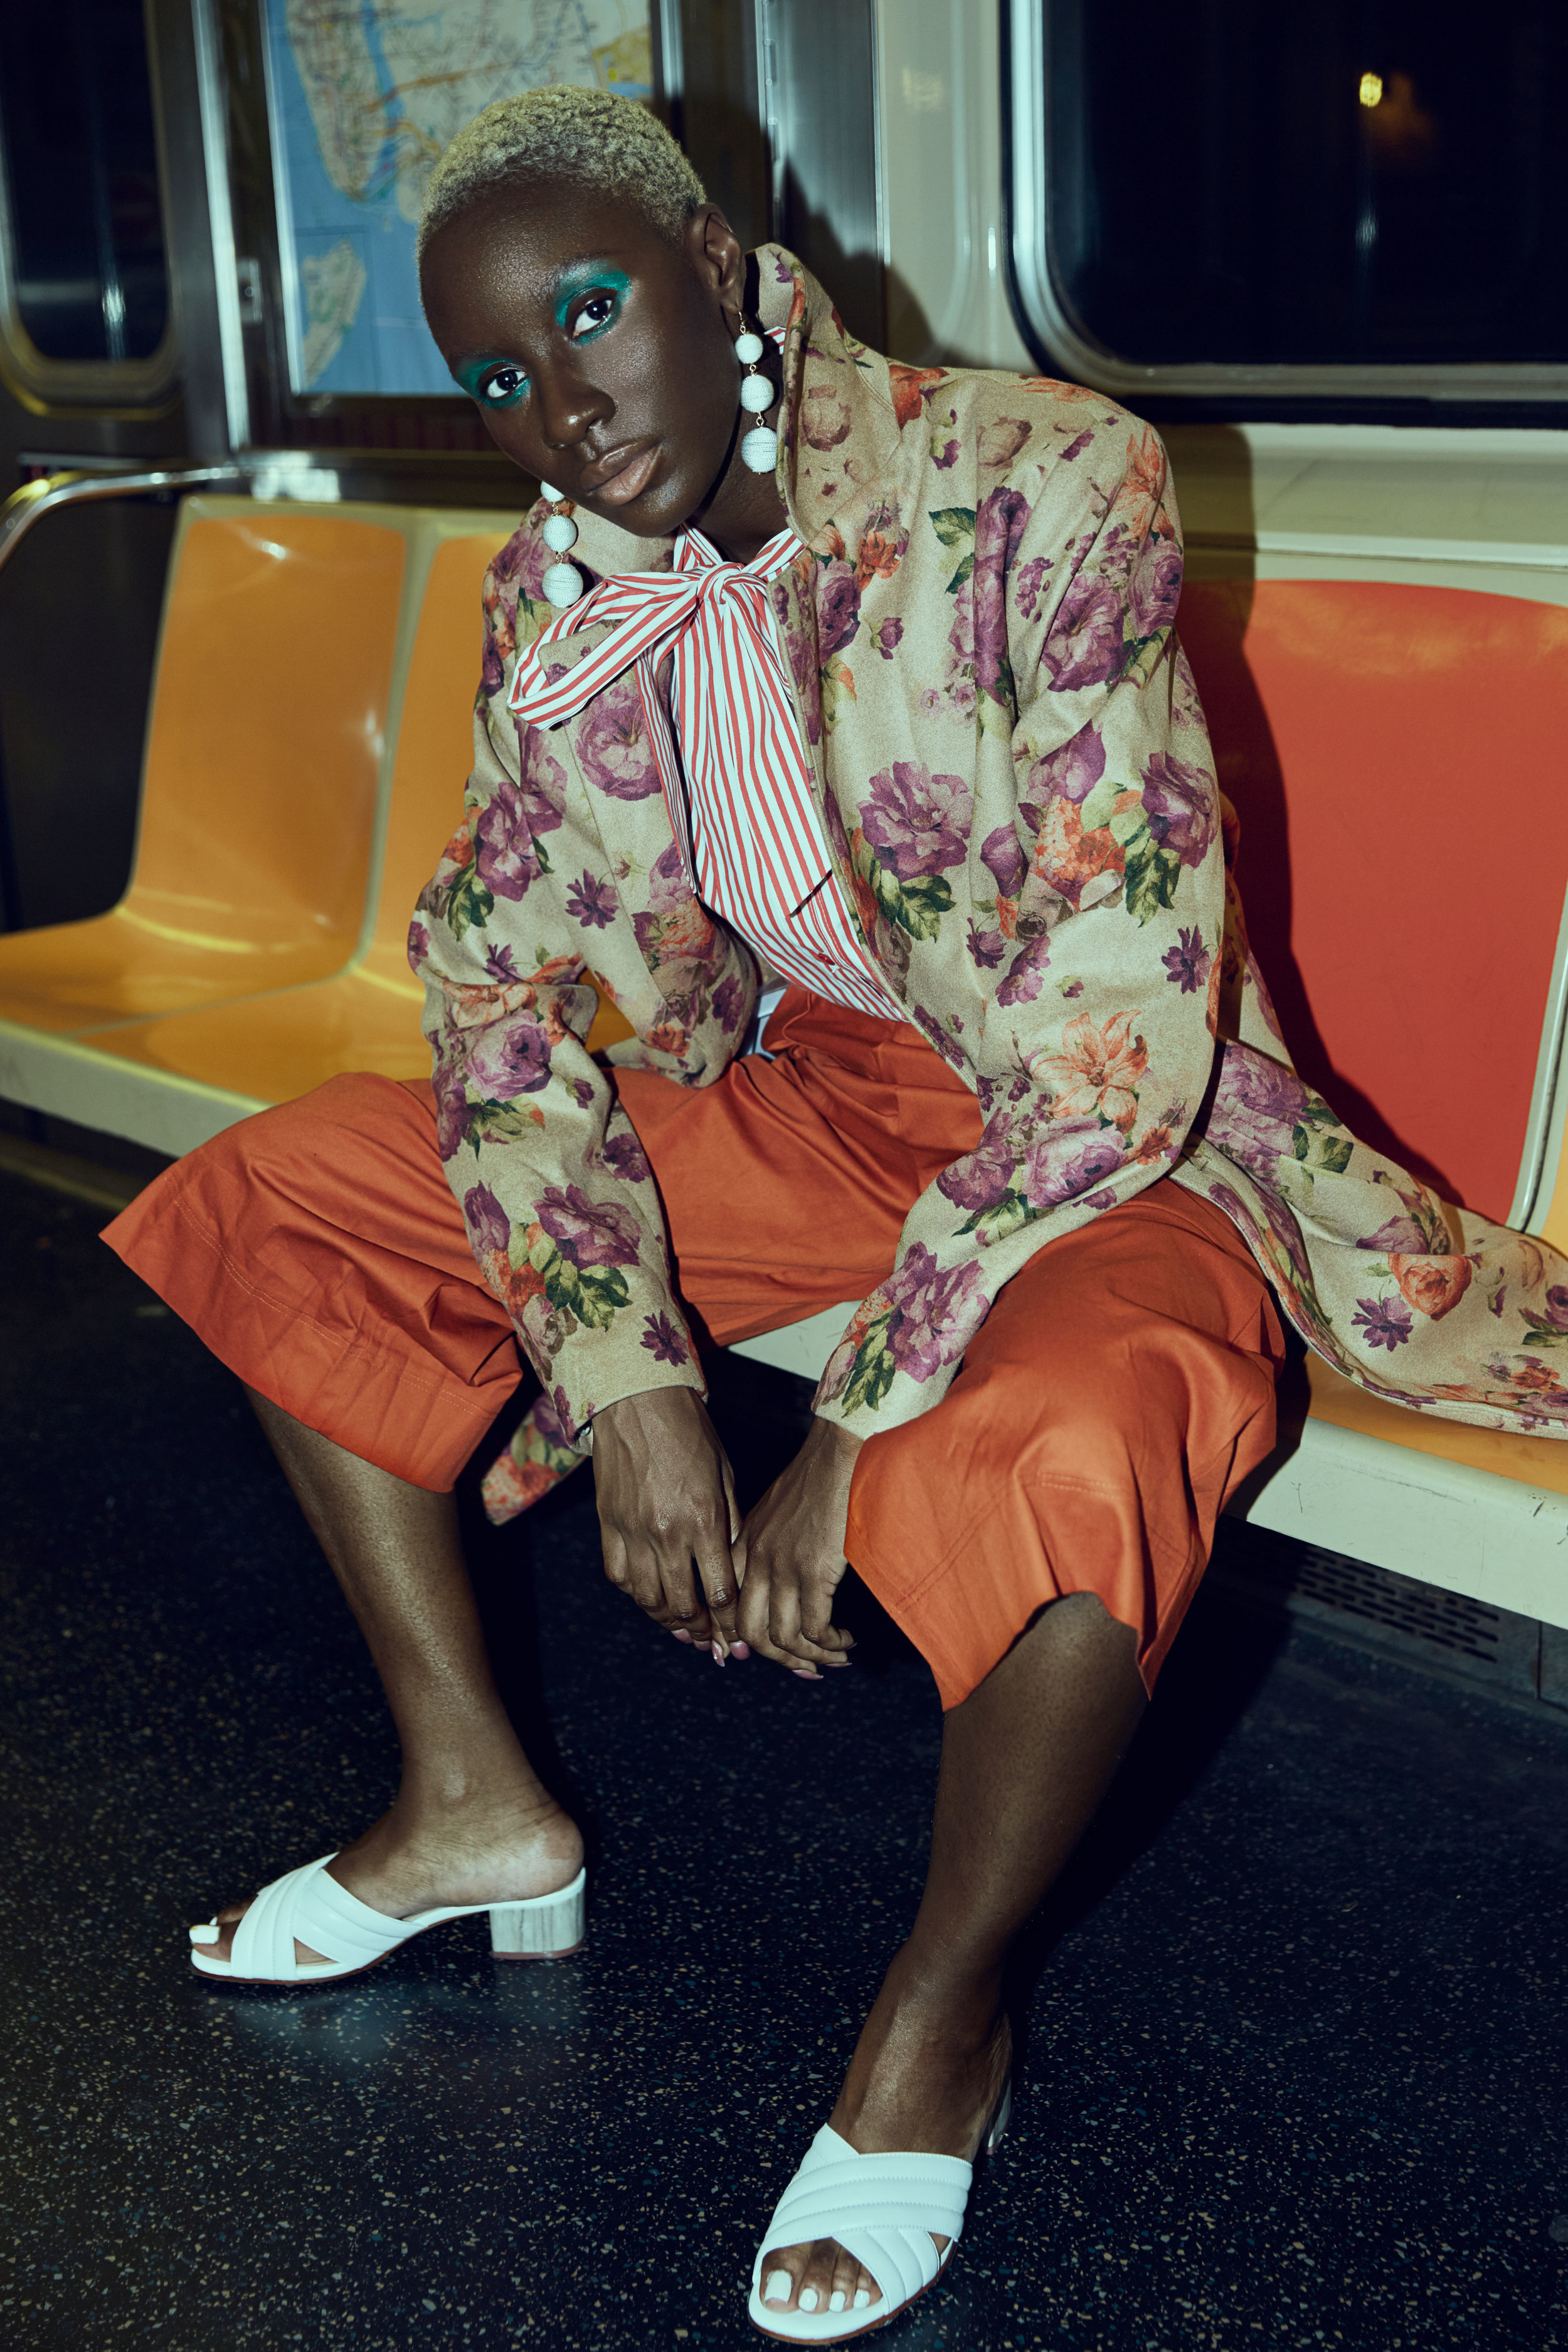 Coat: Asos  Top: Asos  Pants: Asos  Shoes: Antonio Melani  Earrings: Trends by New Direction